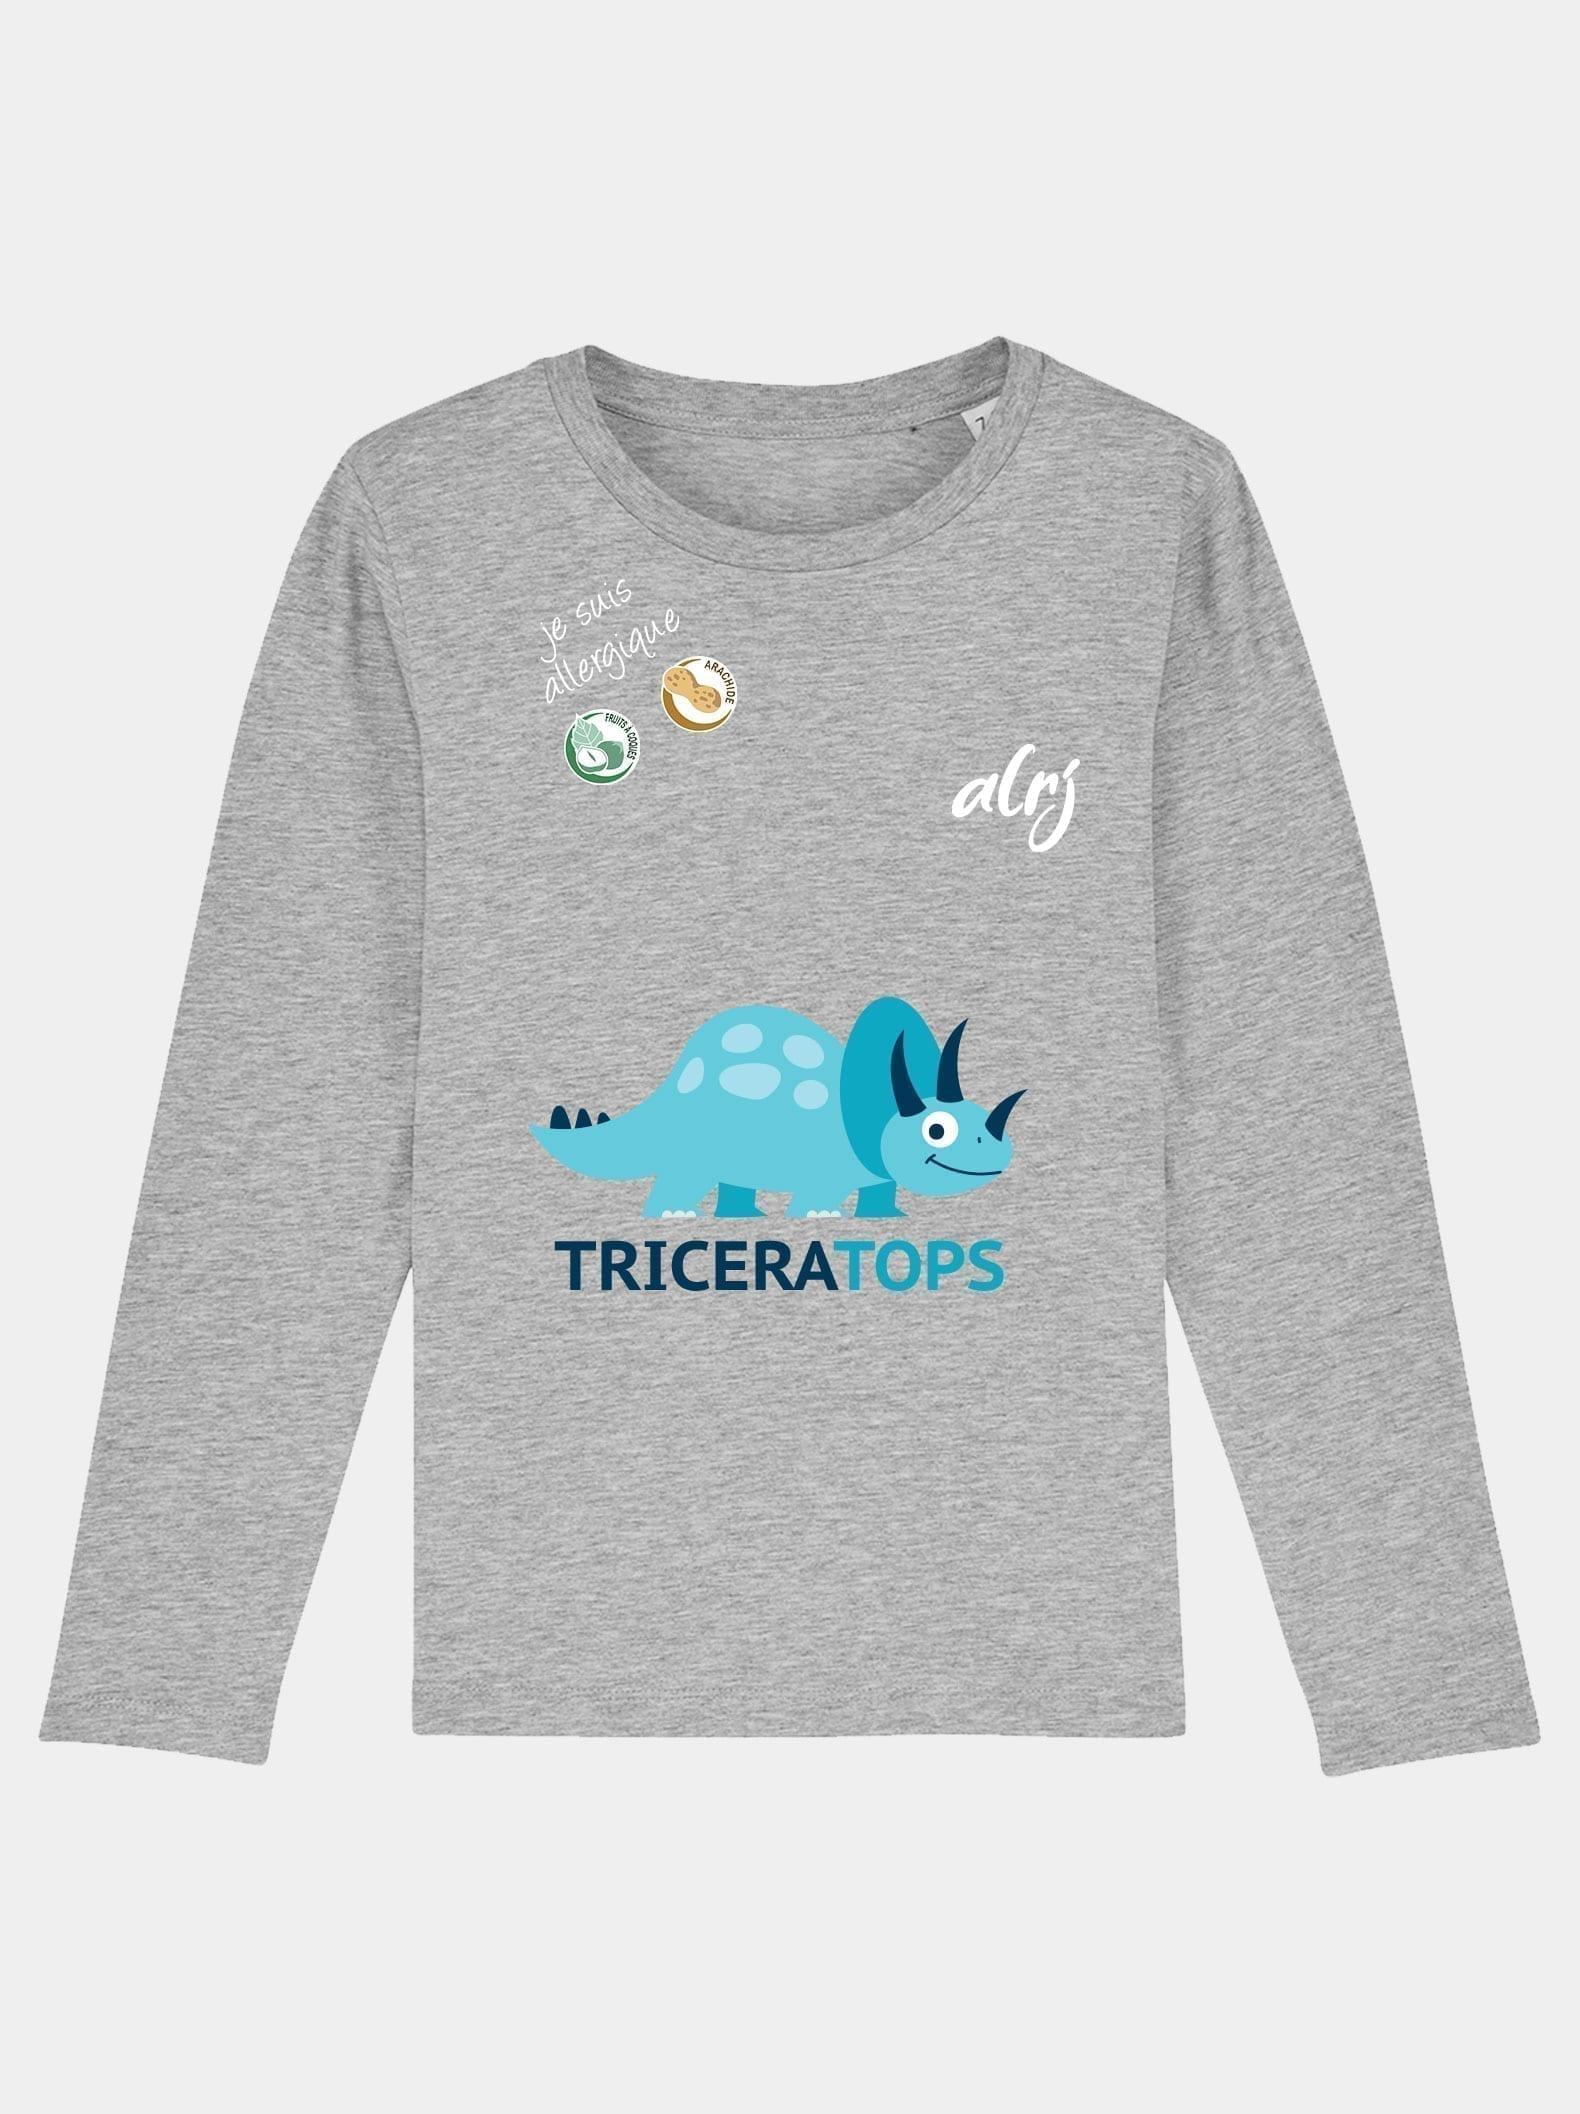 t-shirt manche longue triceratops allergies alimentaires gris chiné